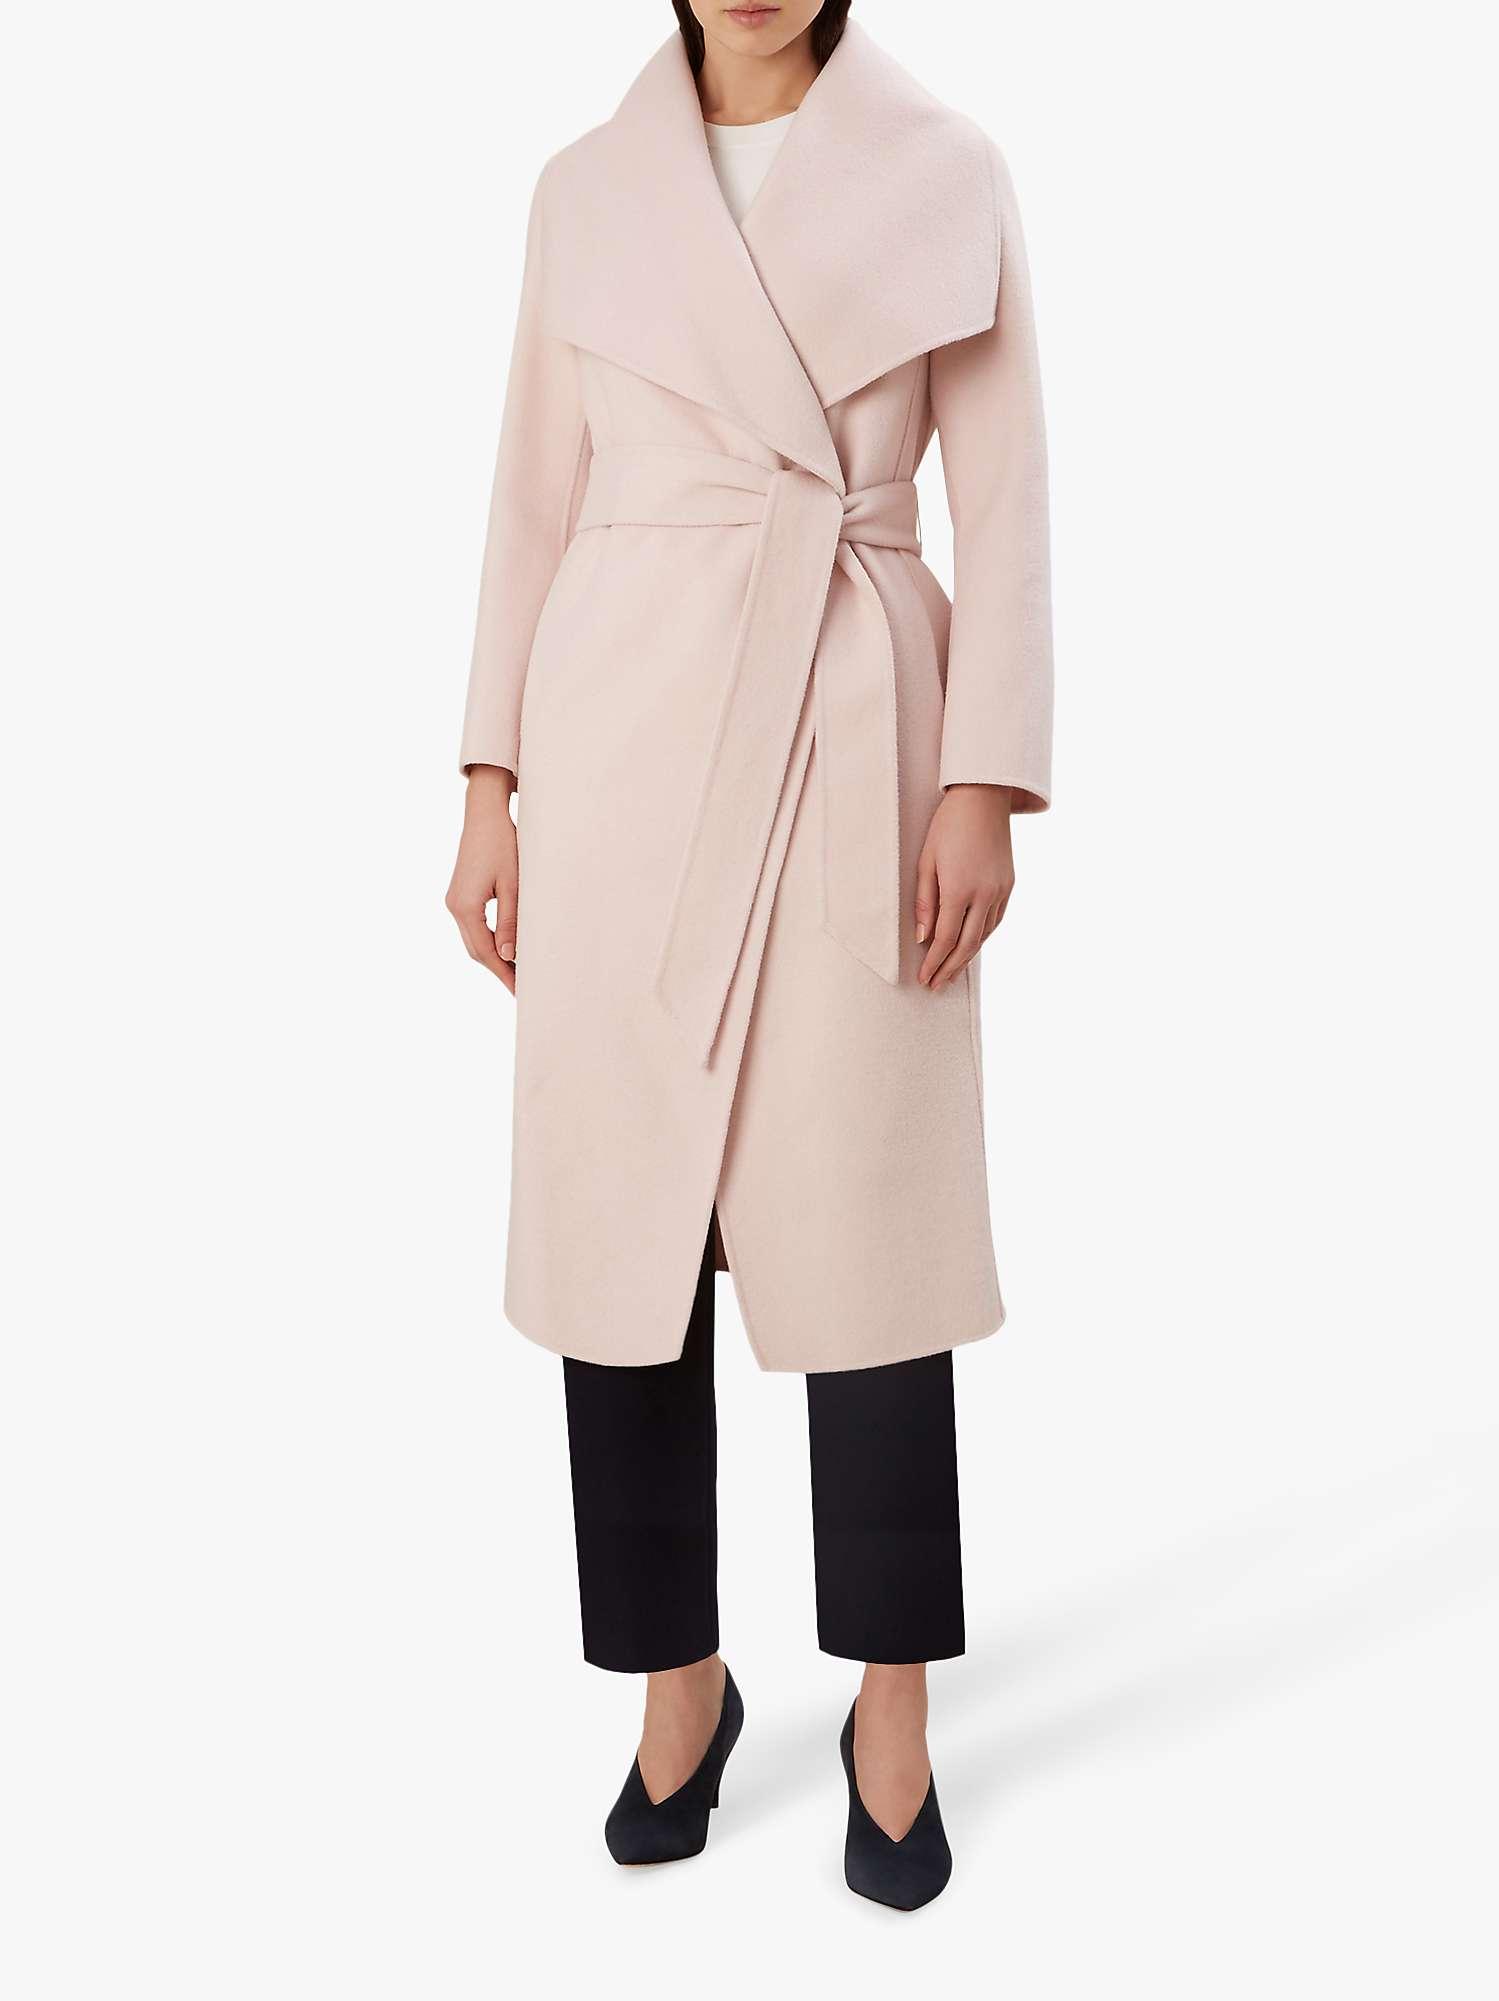 Hobbs Odelia Coat, Pale Pink